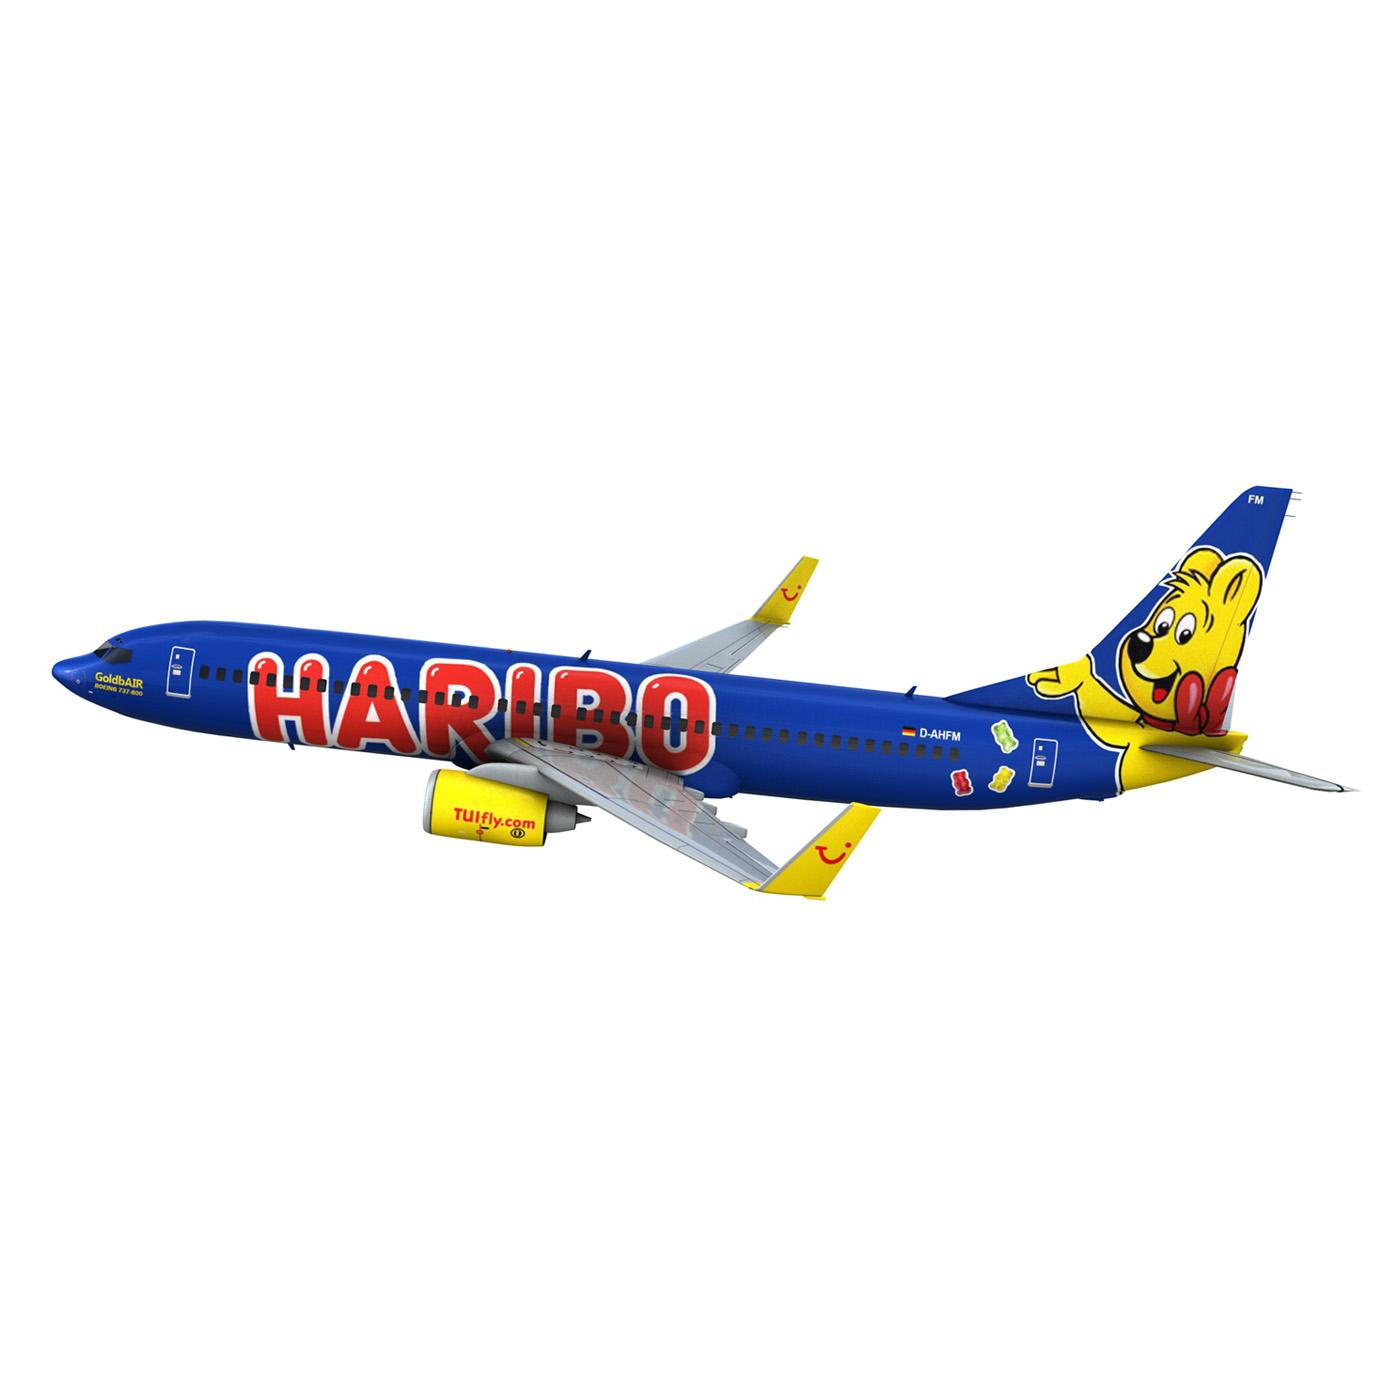 boeing 737-800 goldbair 3d model 3ds fbx c4d lwo obj 293501